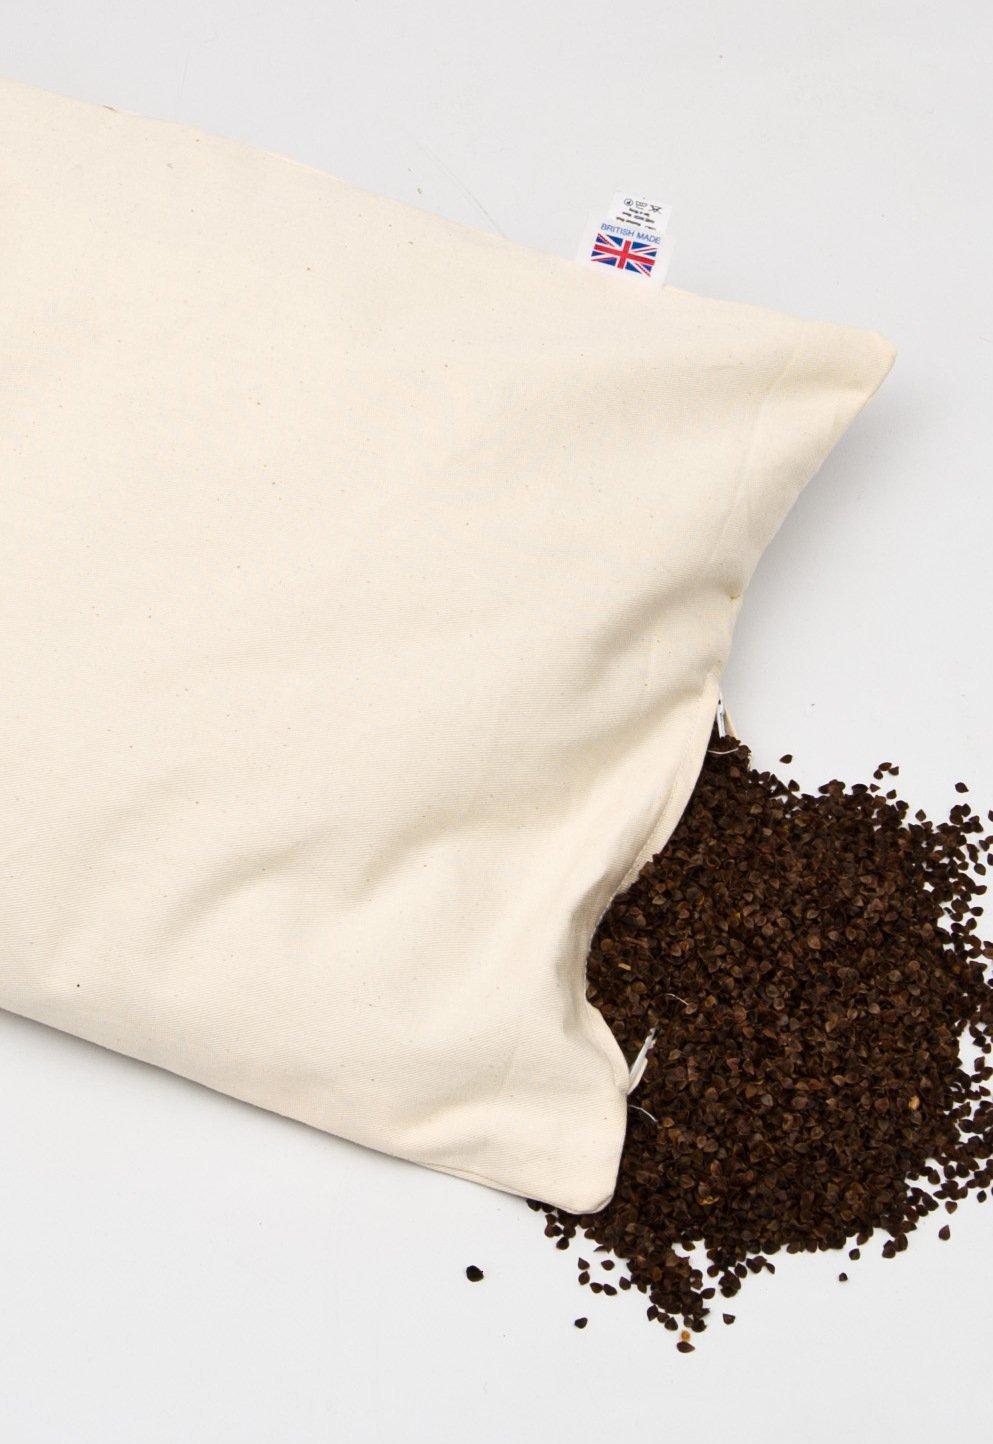 Organic Buckwheat Hull Pillow | Buckwheat Pillow Benefits | Sobakawa Buckwheat Pillow Queen